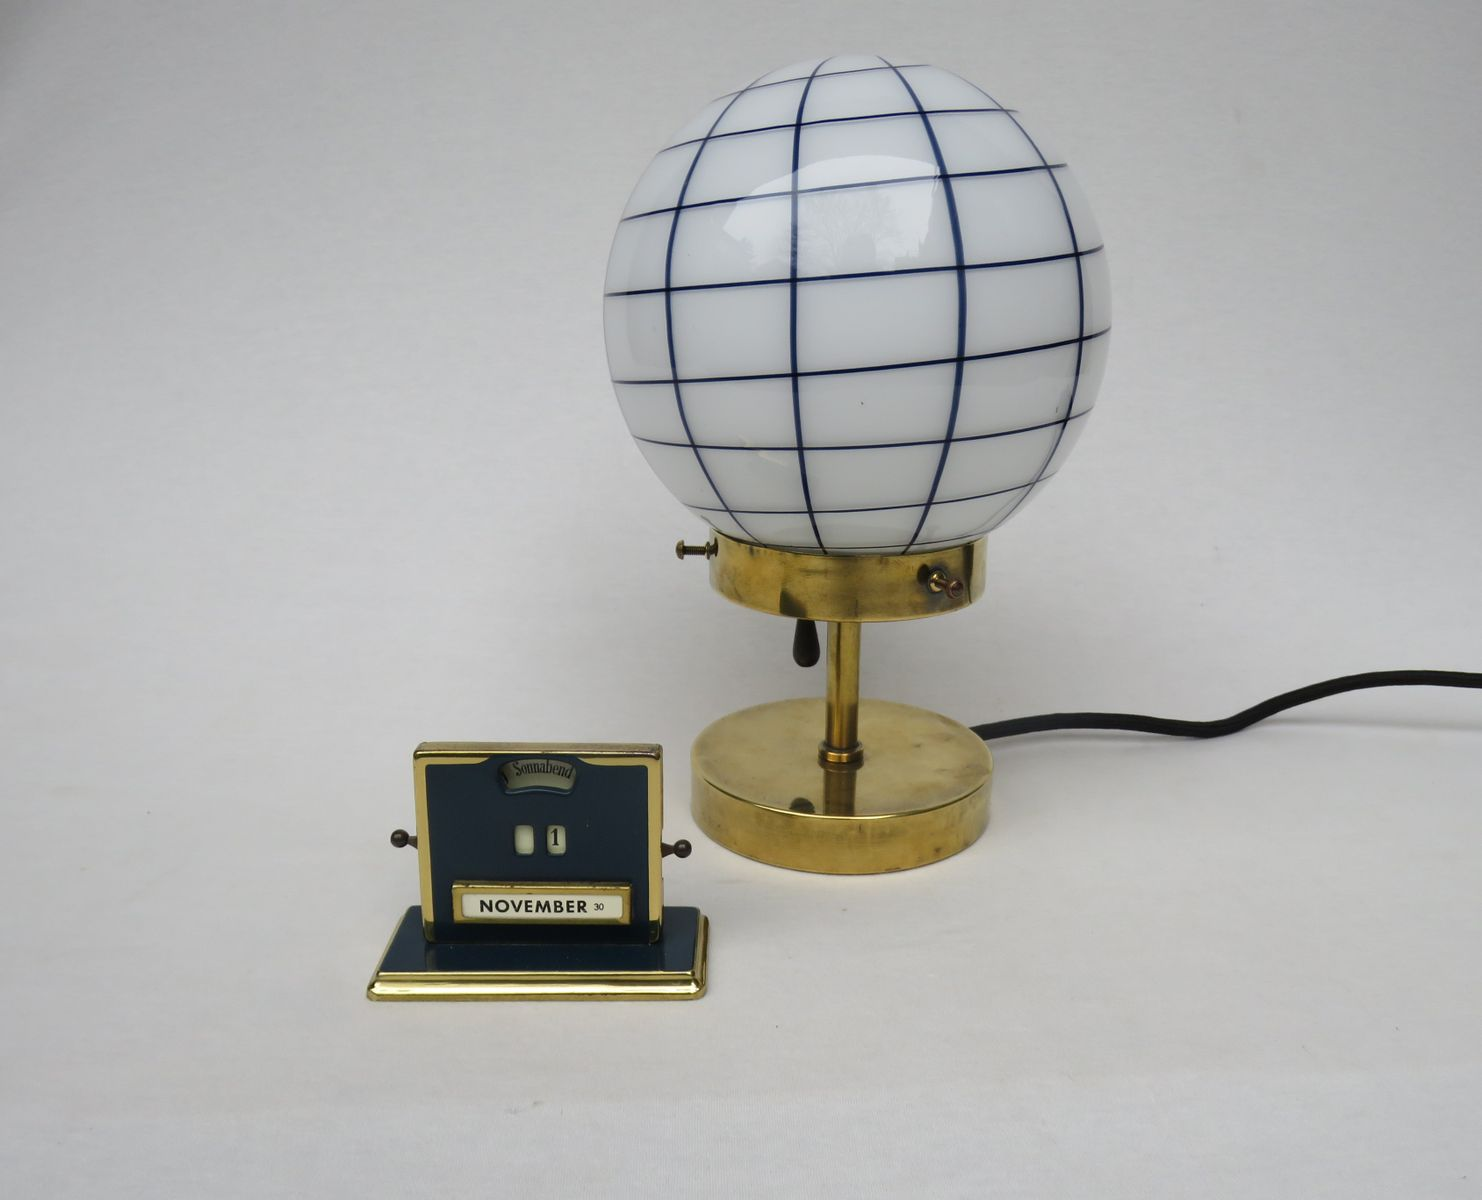 Perpetual Calendar Art Deco : Art deco perpetual calendar by jakob maul s for sale